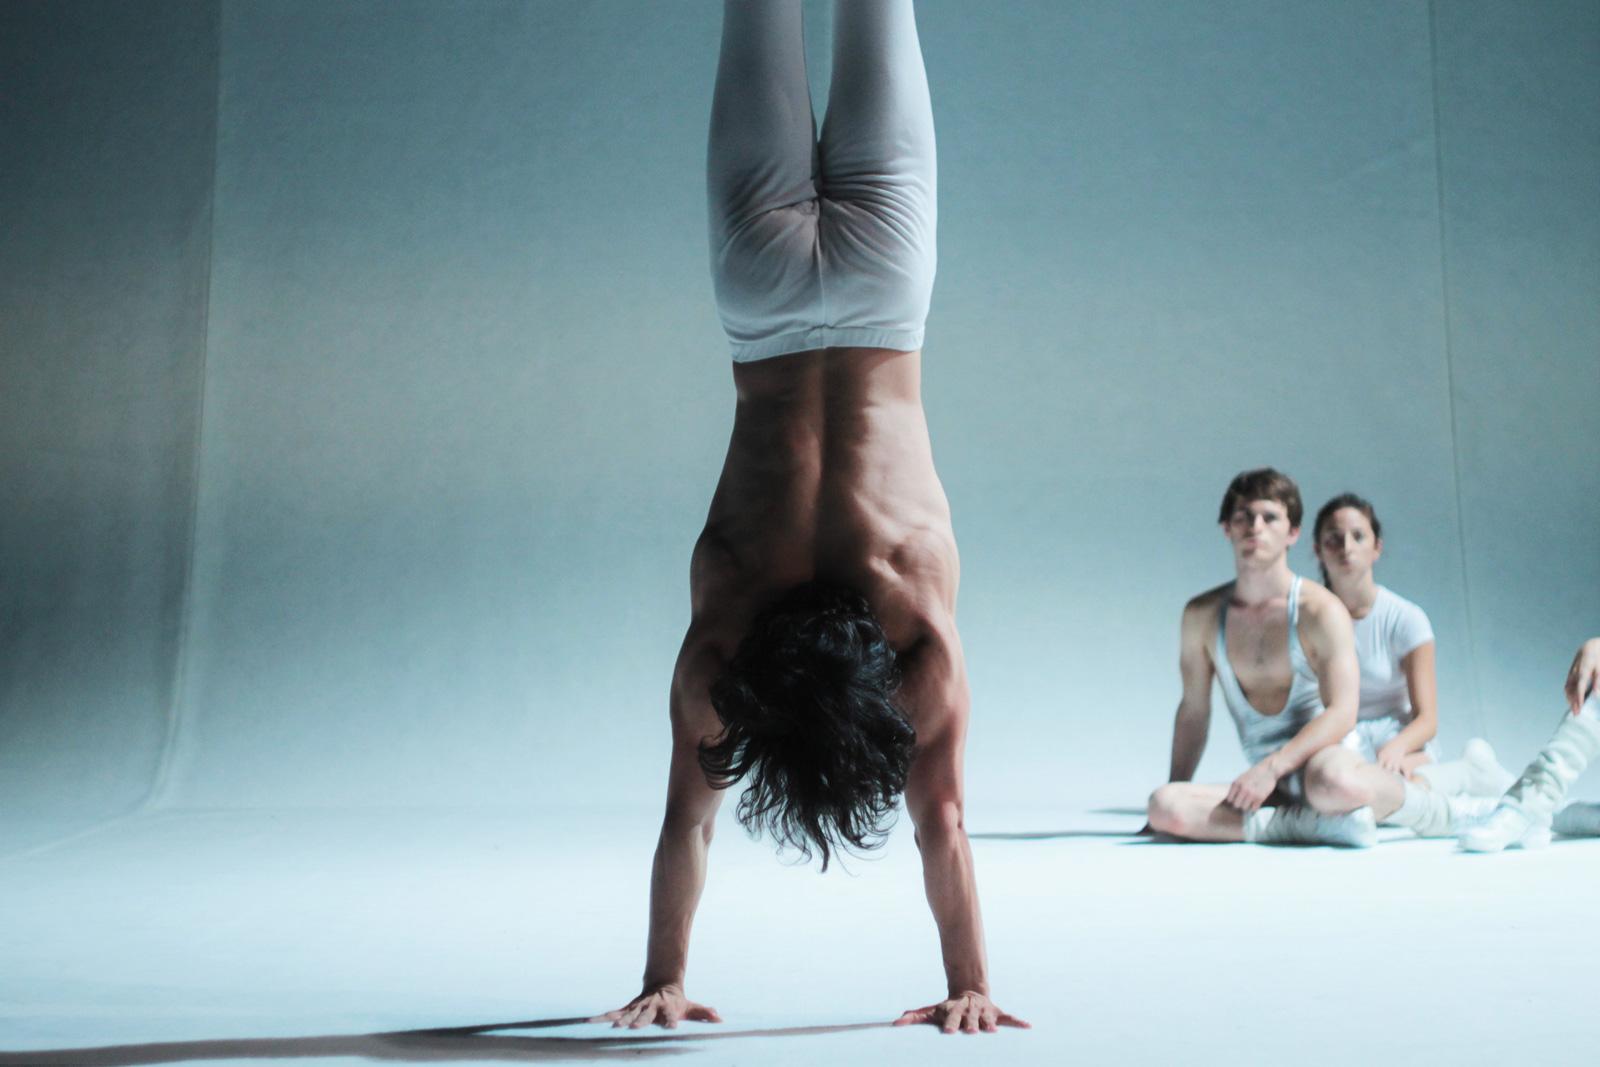 Ballerino in posa verticale